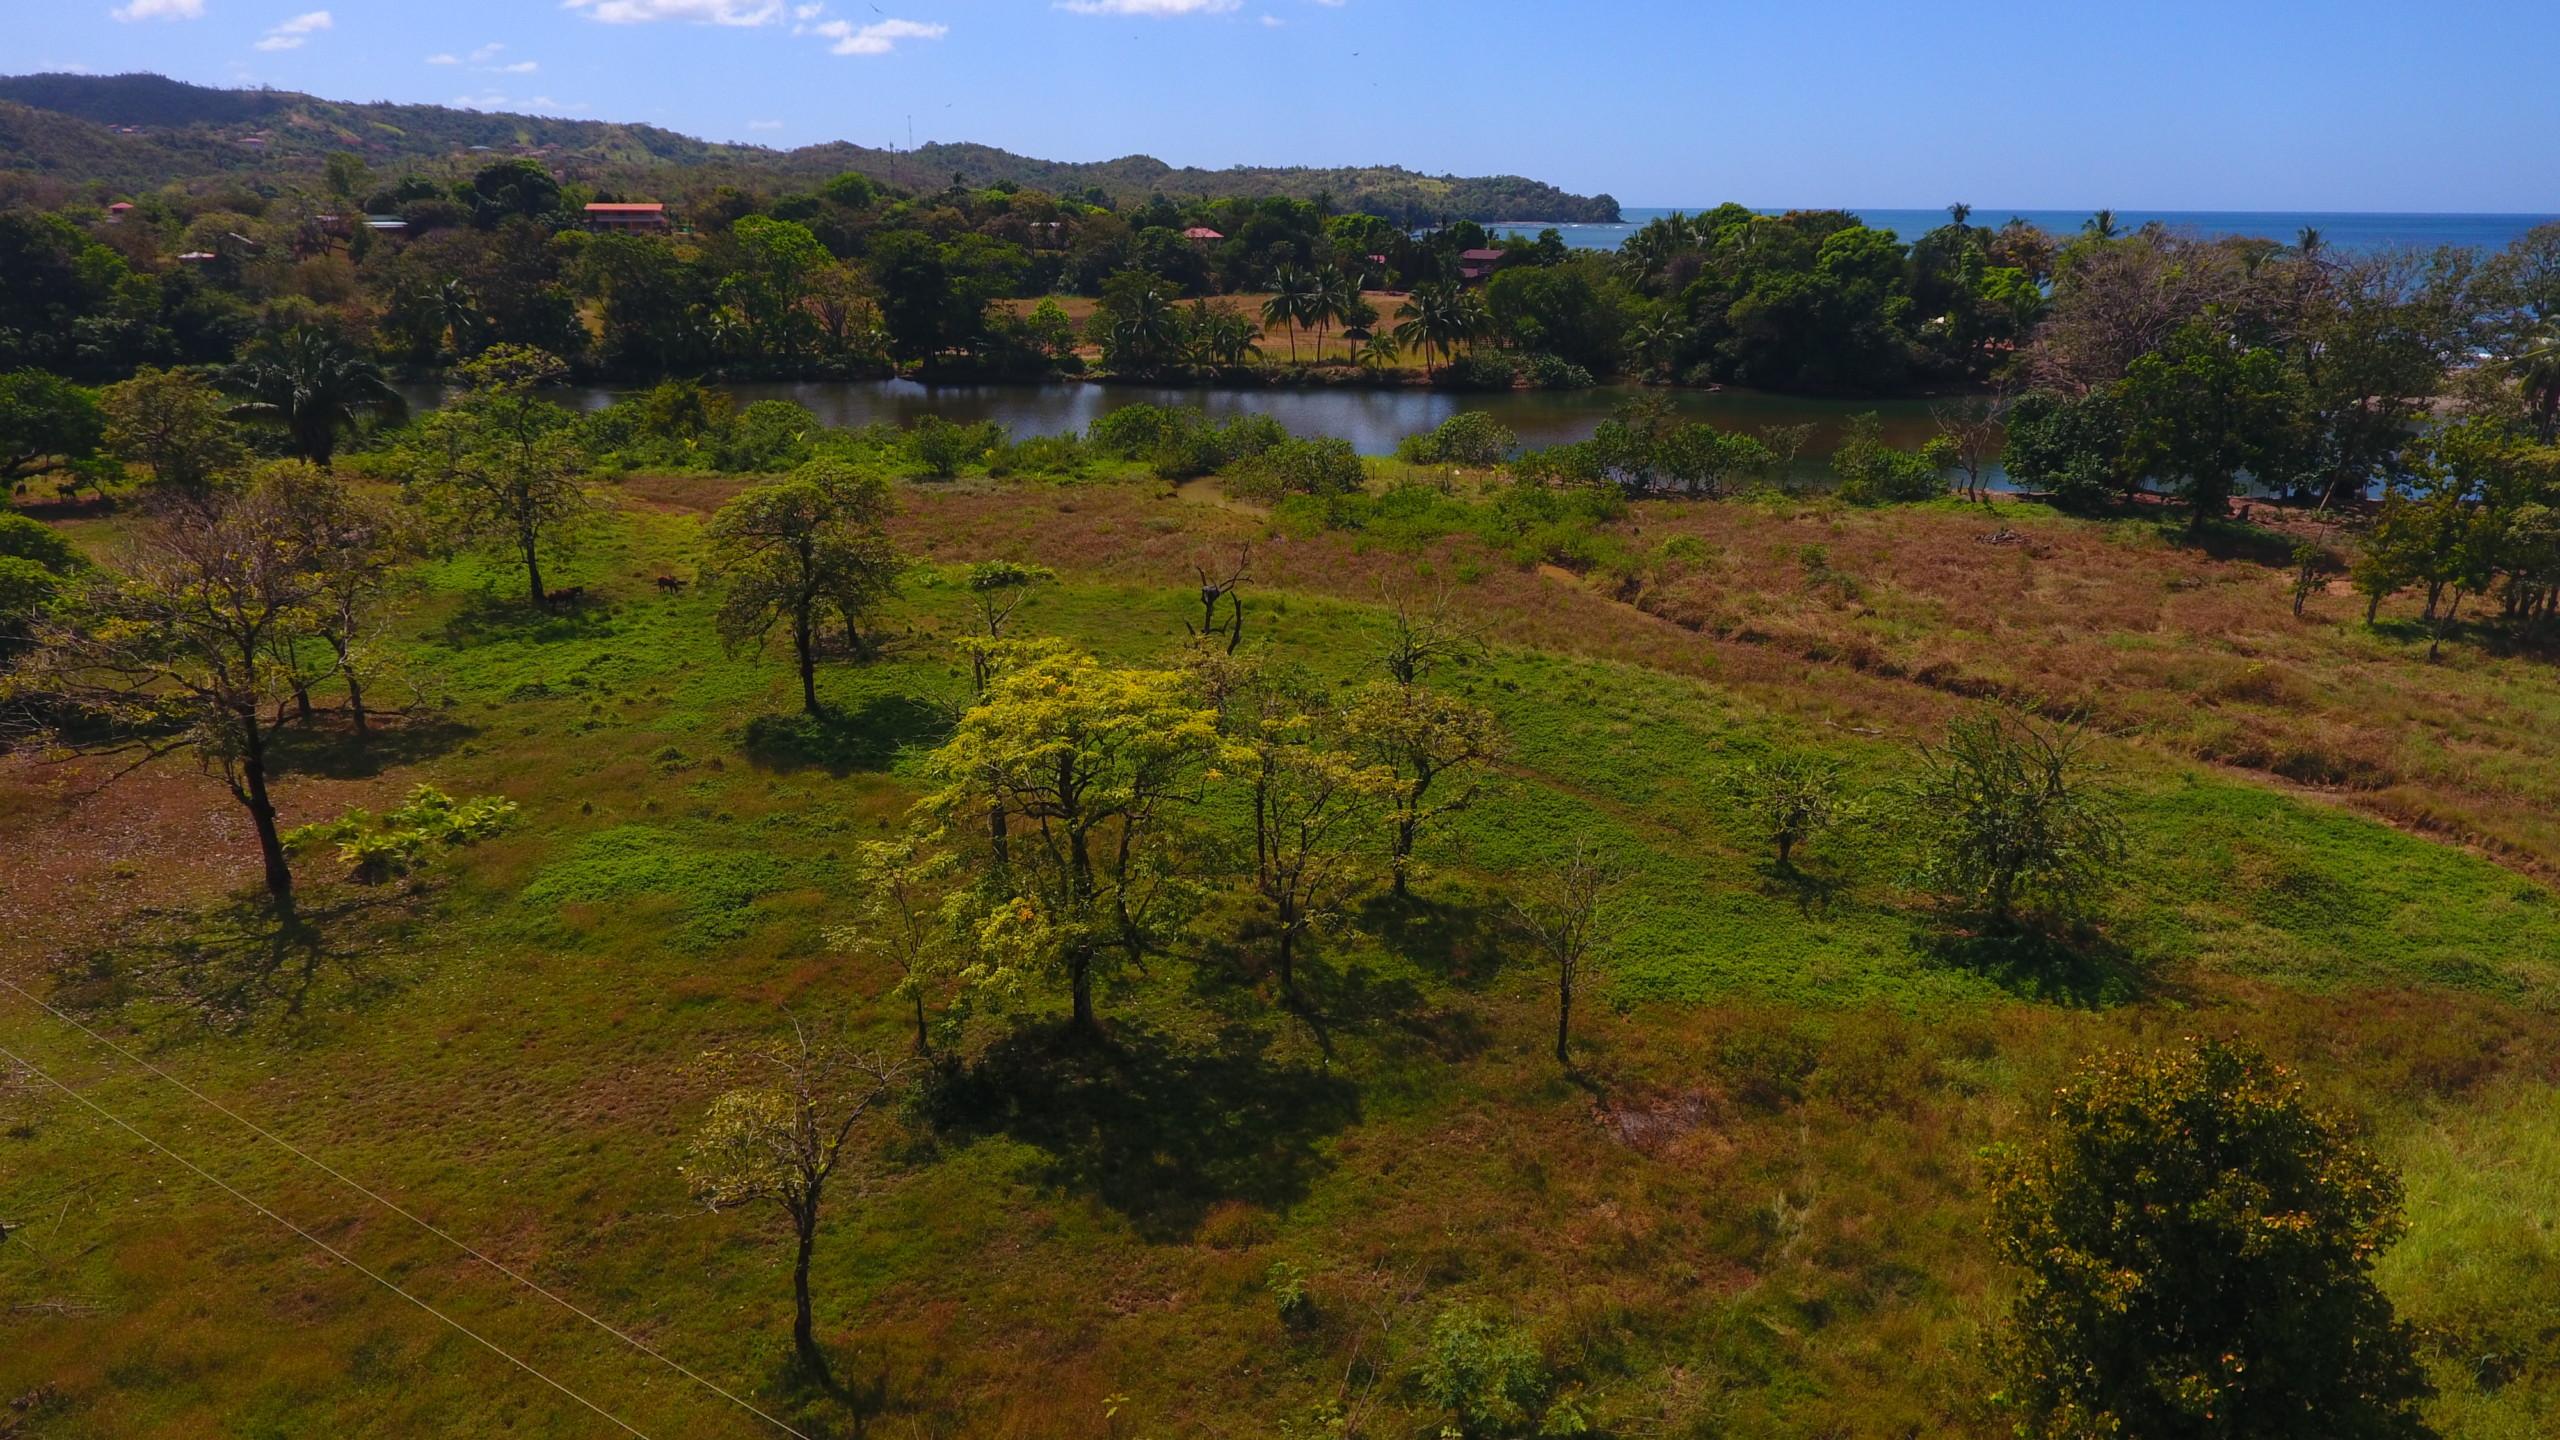 River front property for sale in Torio, Mariato, Veraguas, Panama